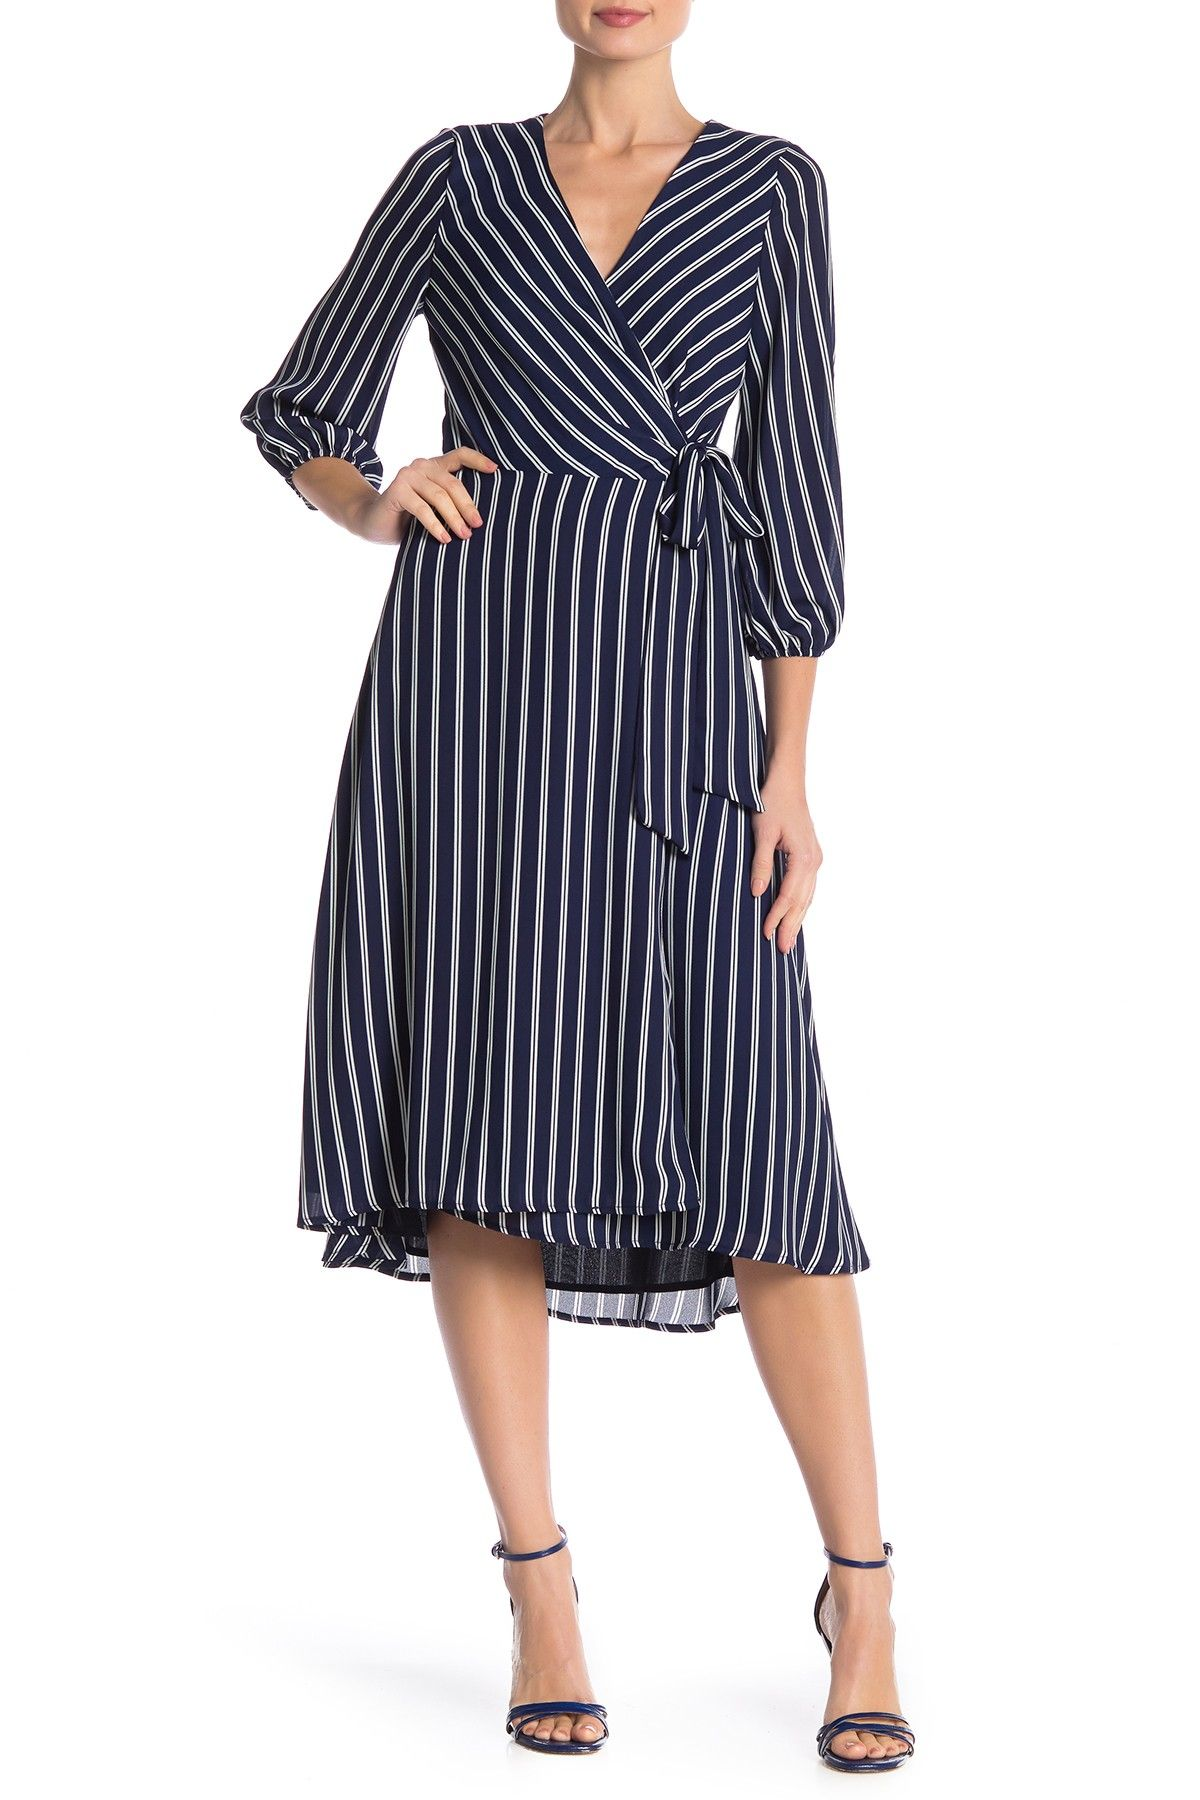 Striped 3 4 Sleeve Wrap Dress By S H E On Nordstrom Rack Wrap Dress Nordstrom Dresses Dresses [ 1800 x 1200 Pixel ]